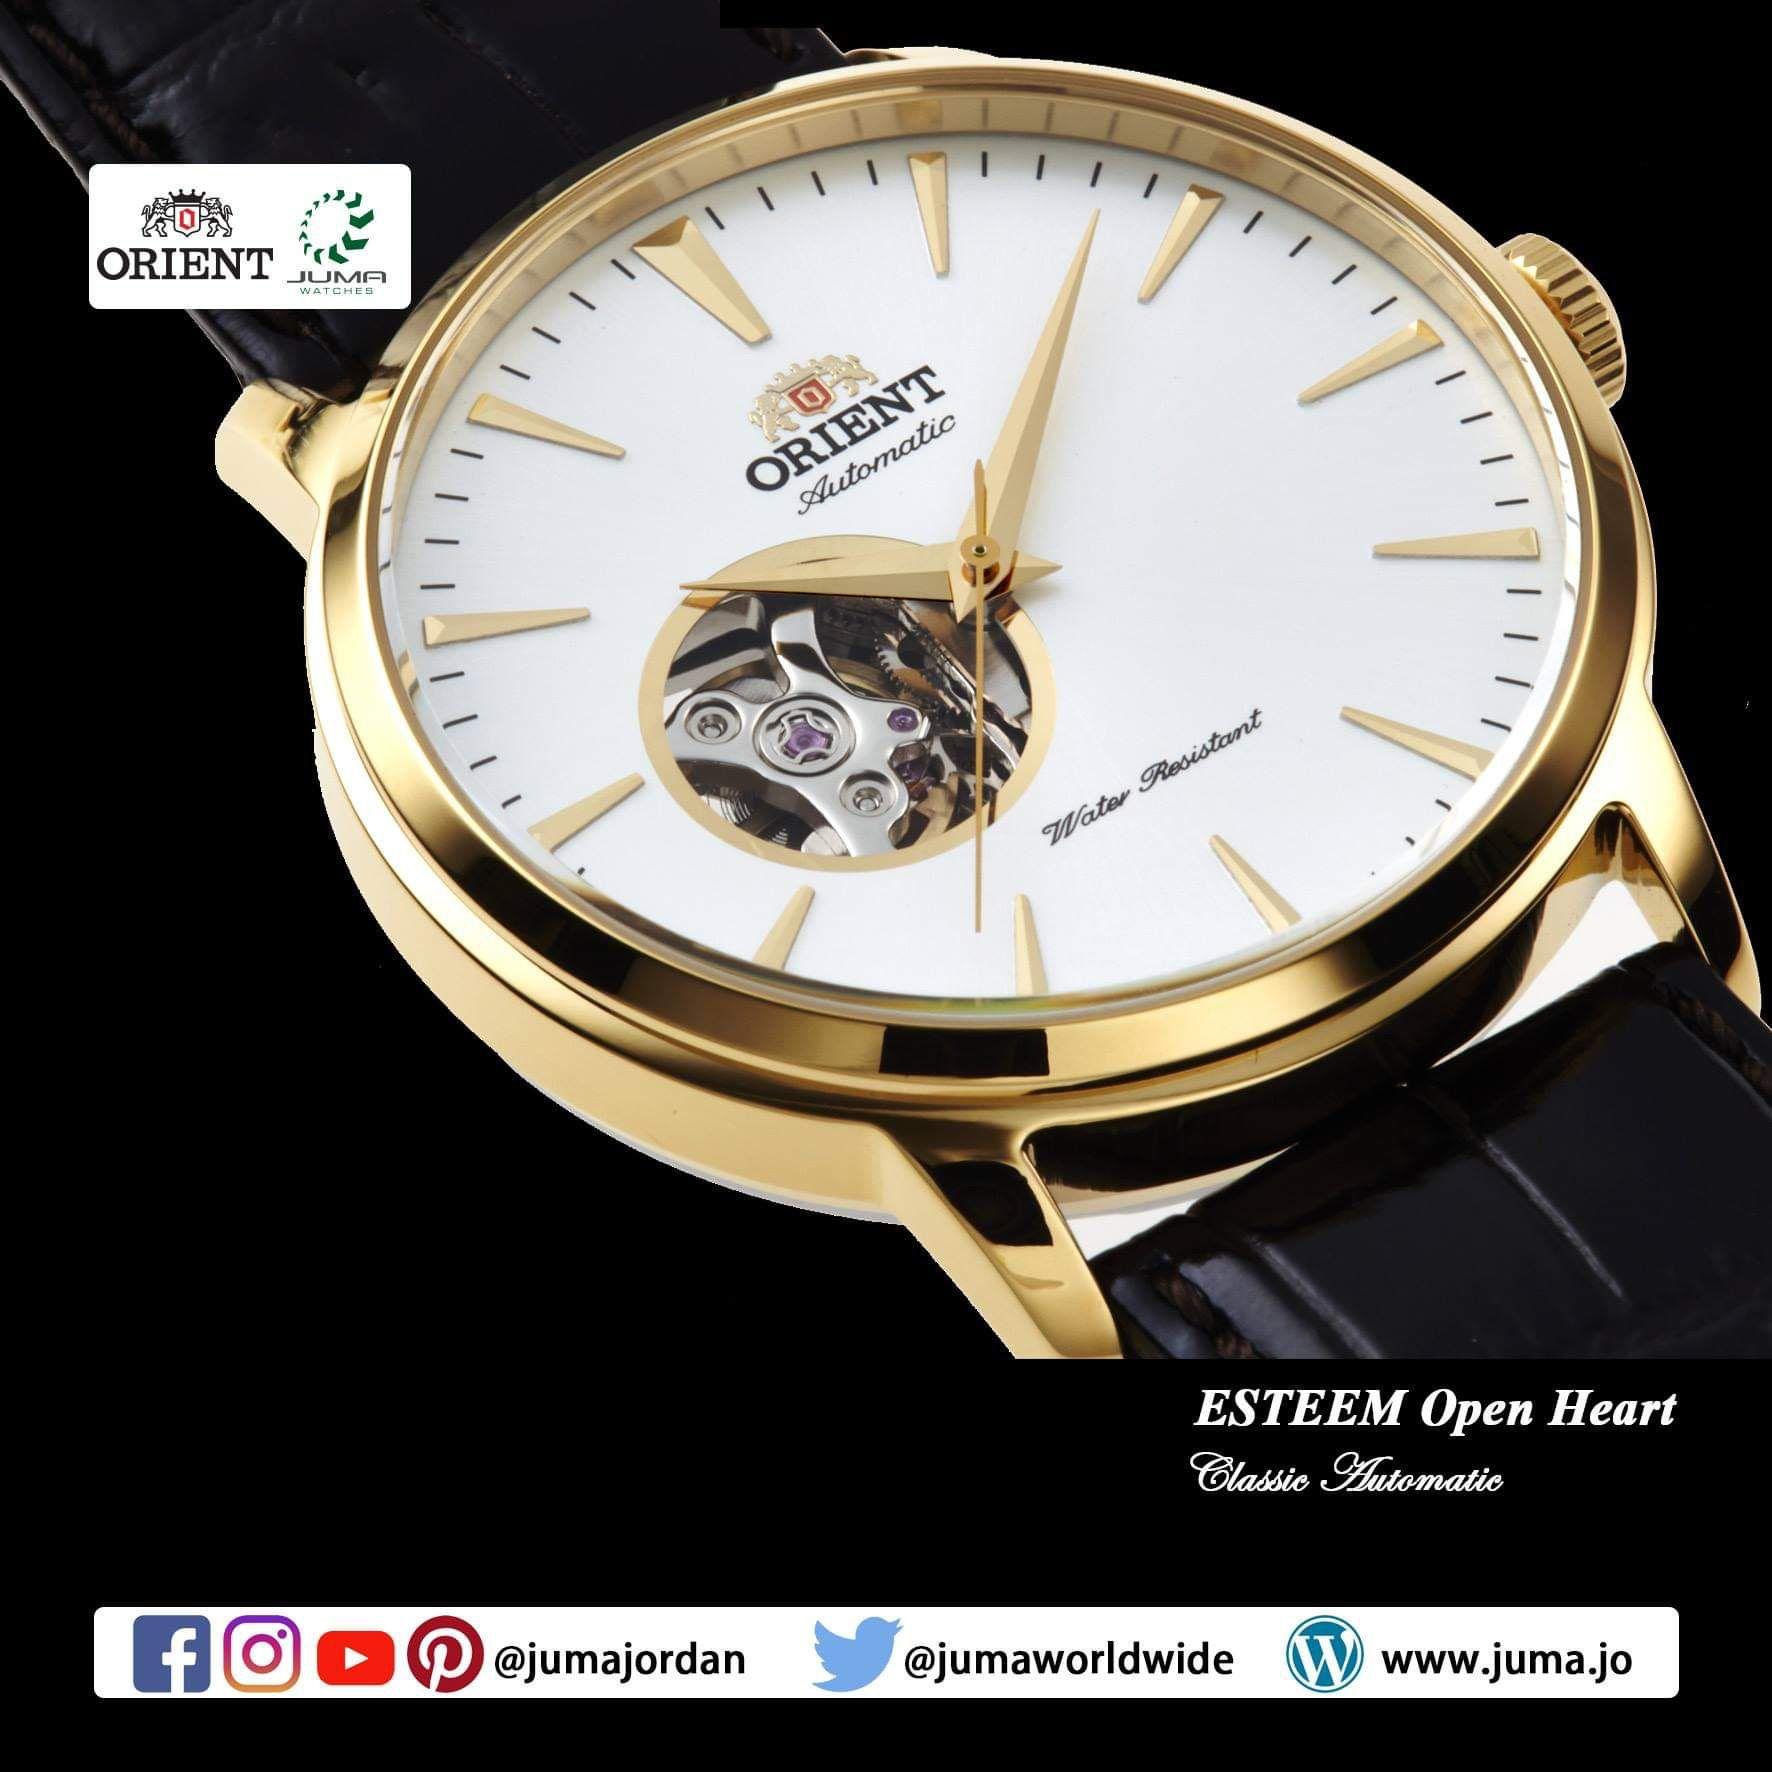 Orient Esteem Open Heart Mechanical Contemporary Watch Leather Strap 41 0mm Case Orientwatches Orie Contemporary Watches Watches For Men Womens Watches